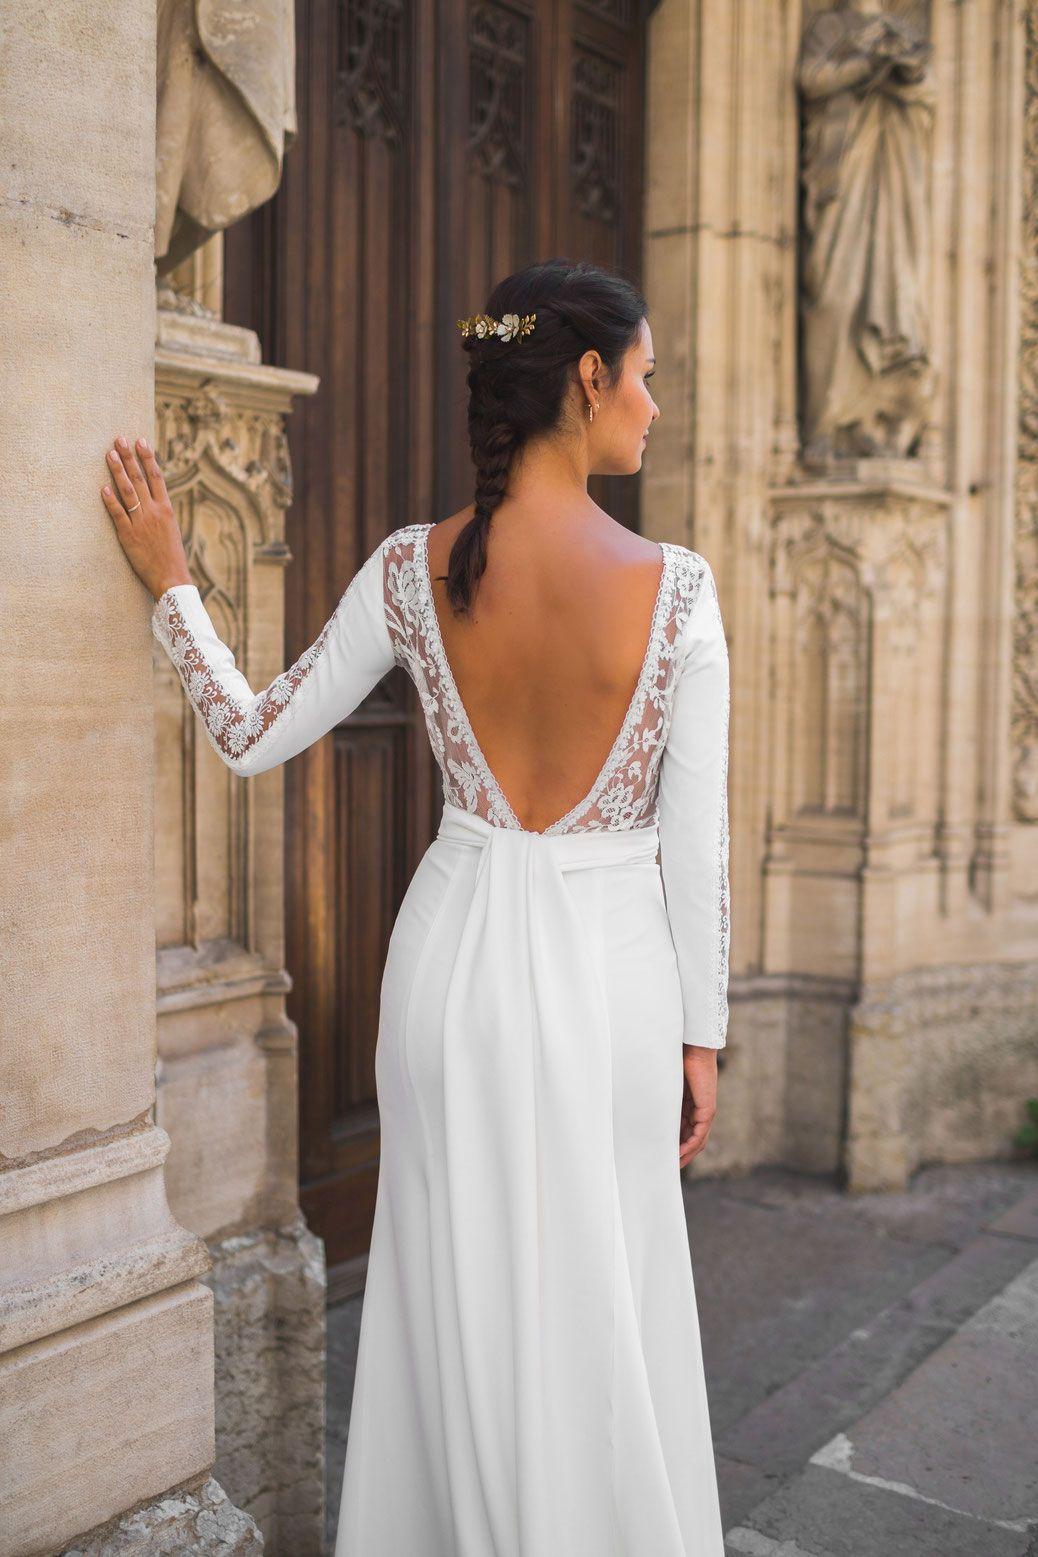 a68fb178bc5 Robe Escallonia - Ludivine Guillot - Robe de mariée sur mesure - Lyon